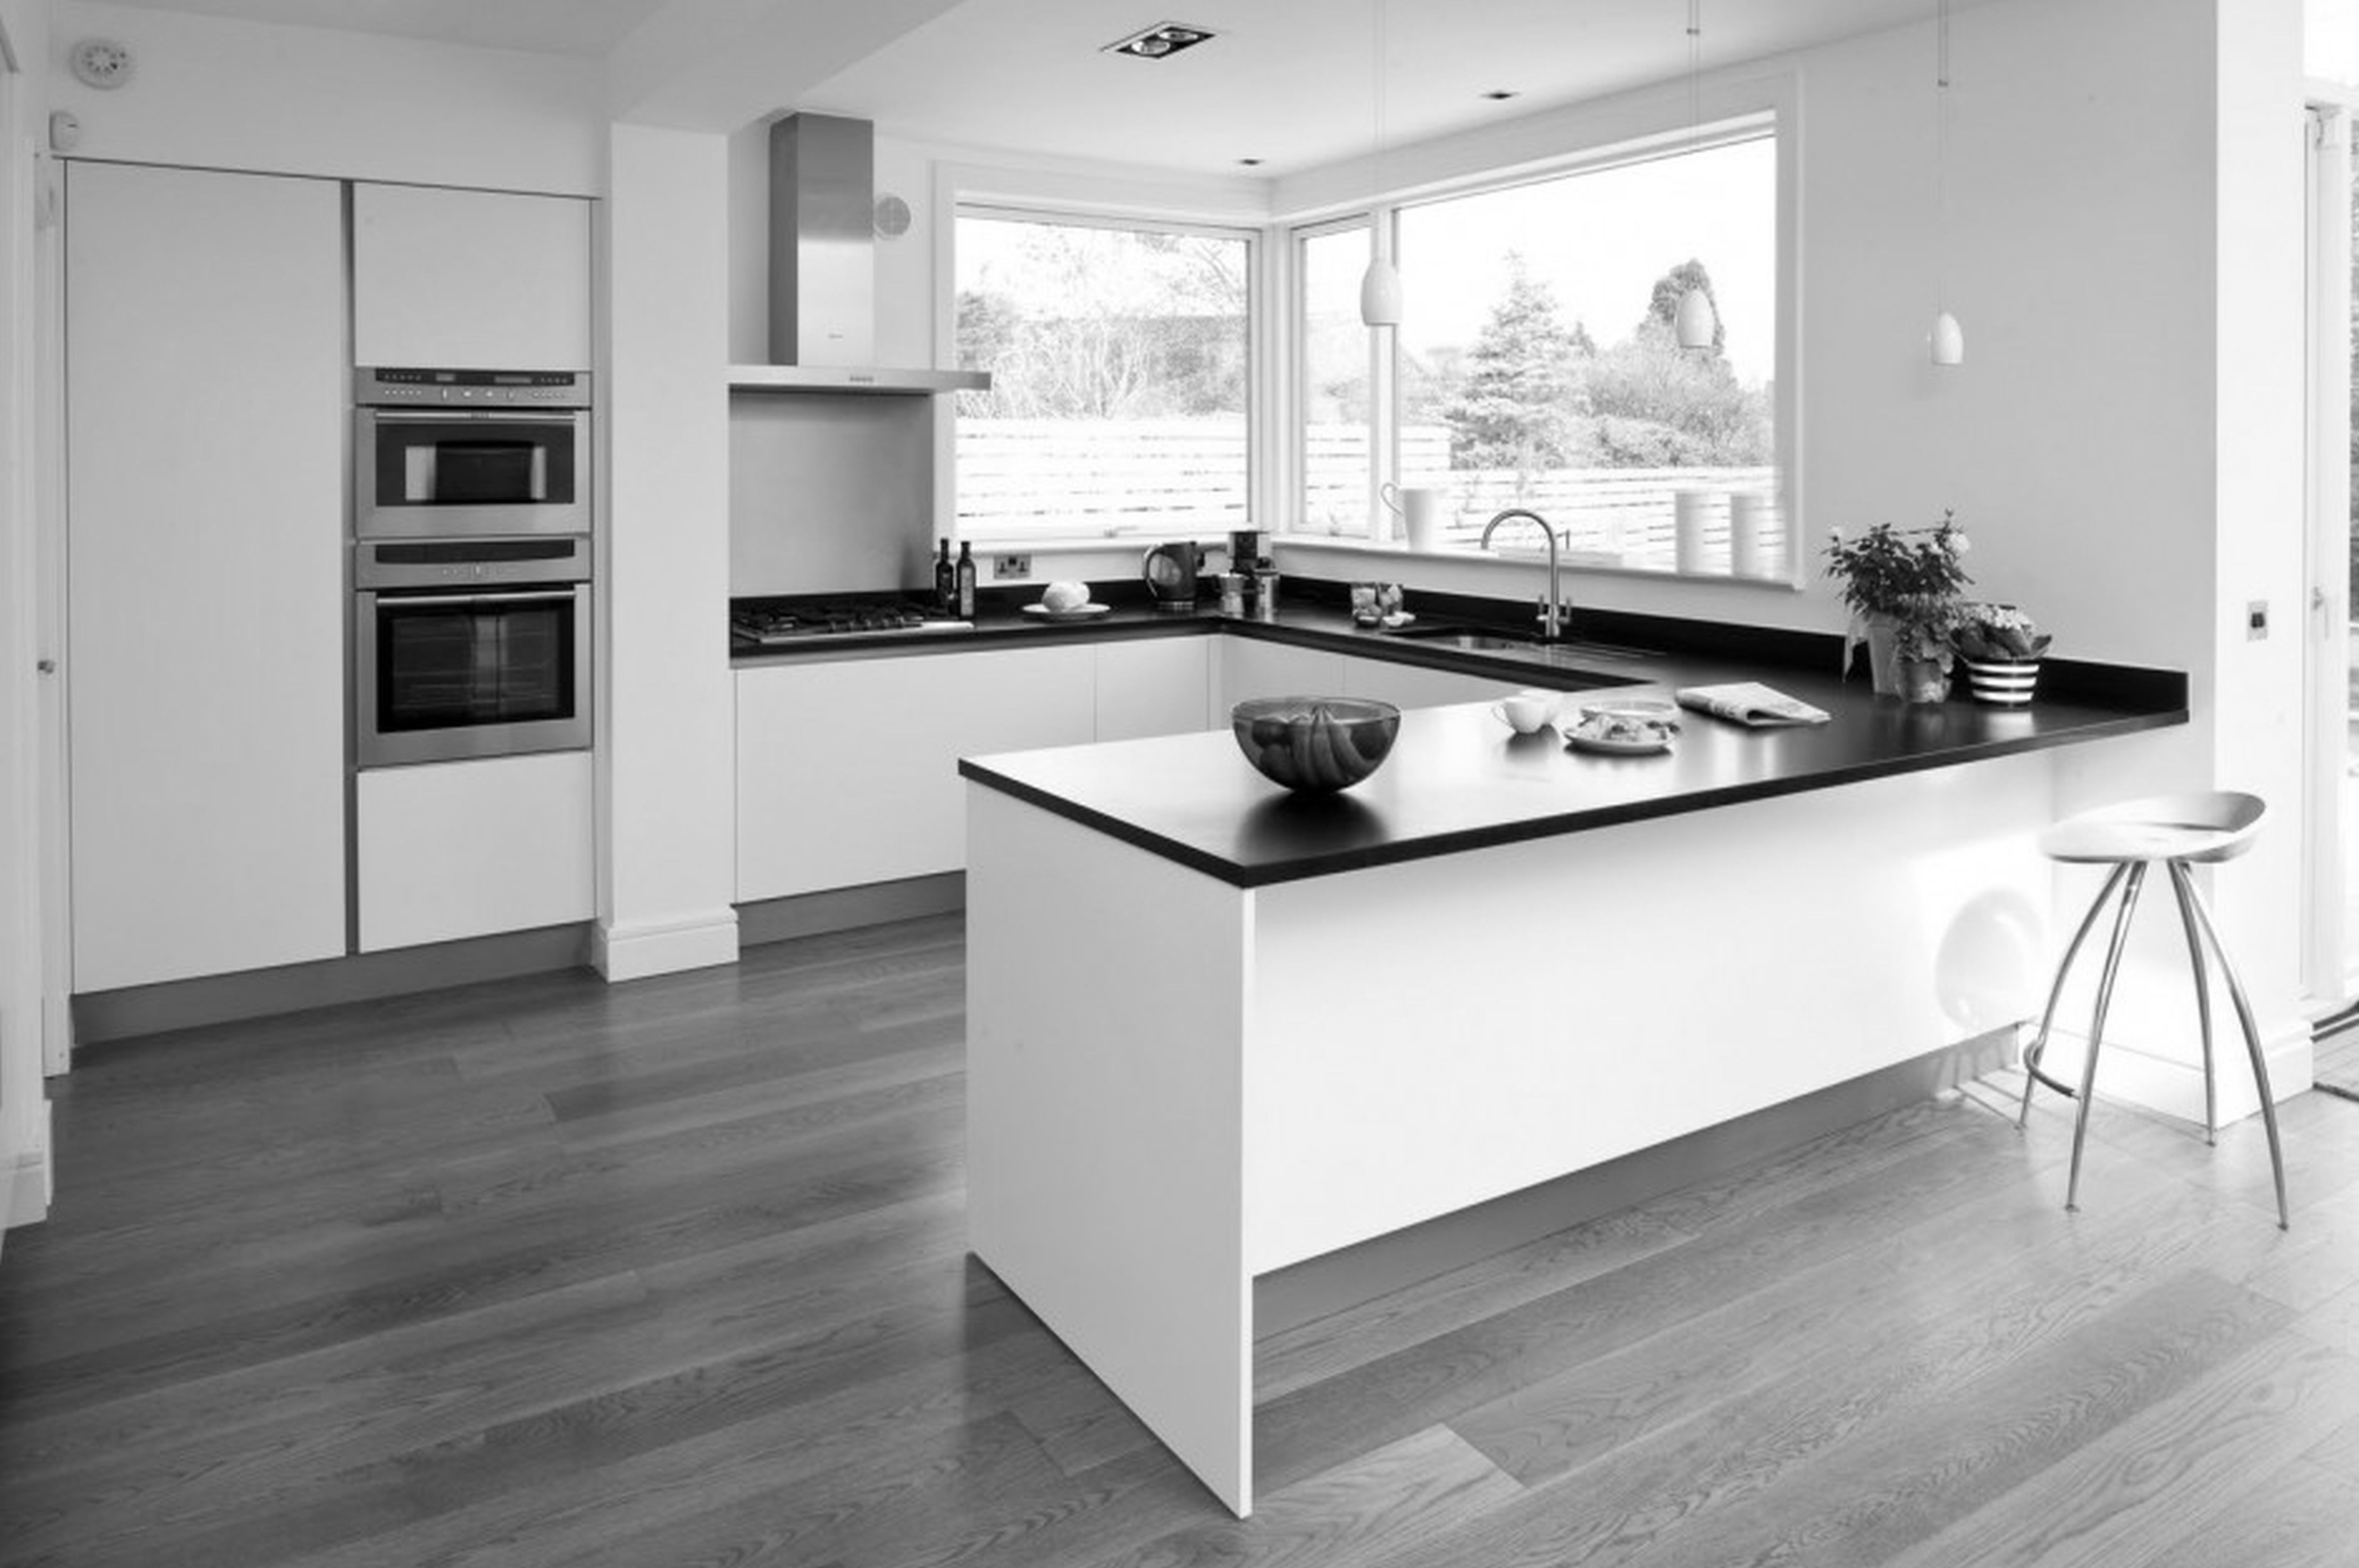 Hardwood Flooring Gorgeous Grey Hardwood Floors Home Depot For Wood